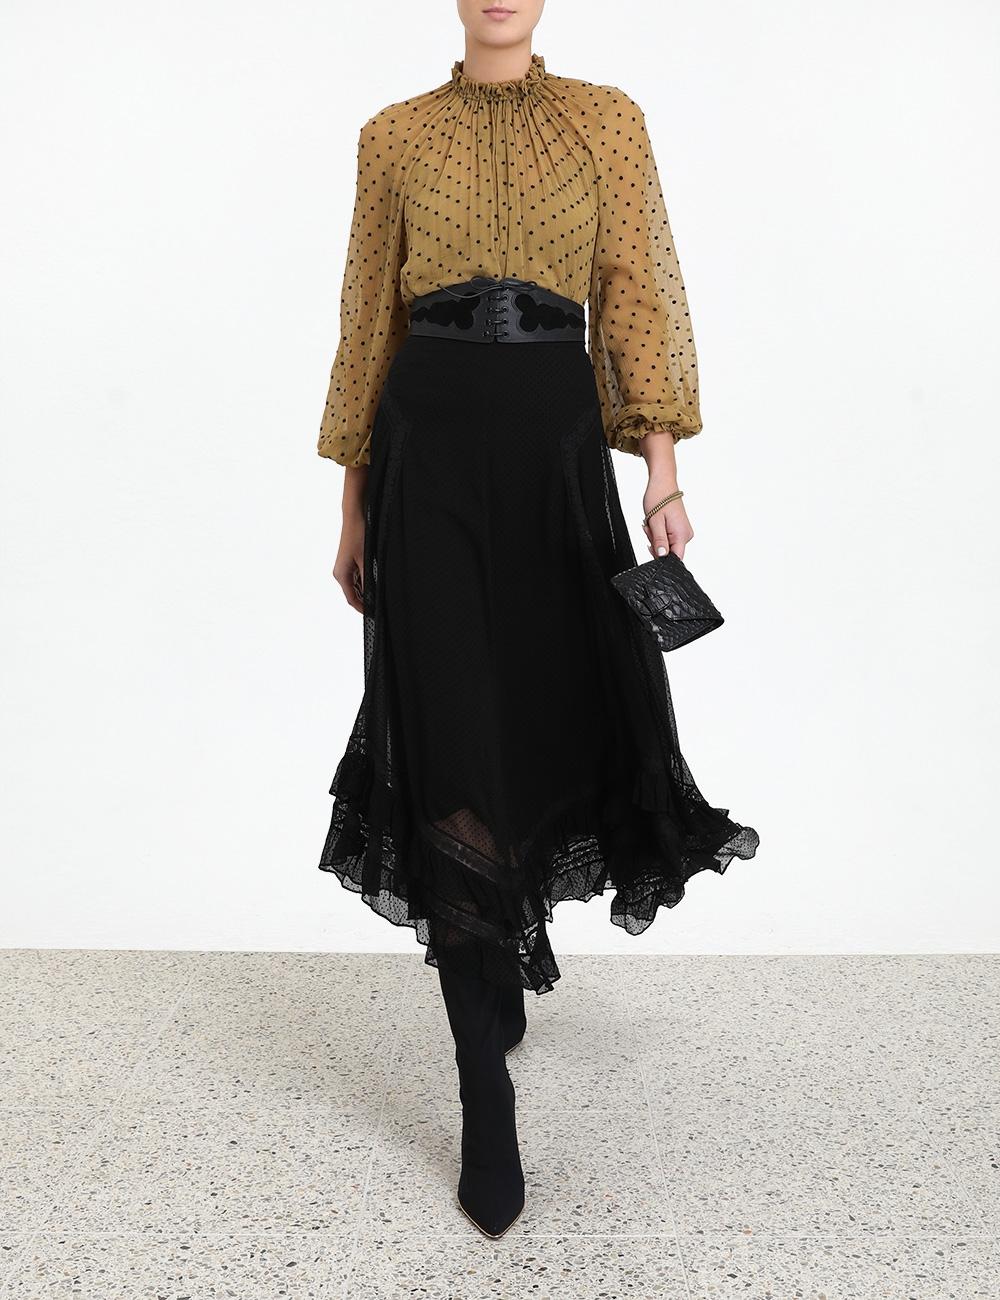 Sabotage Ruffle Lace Skirt